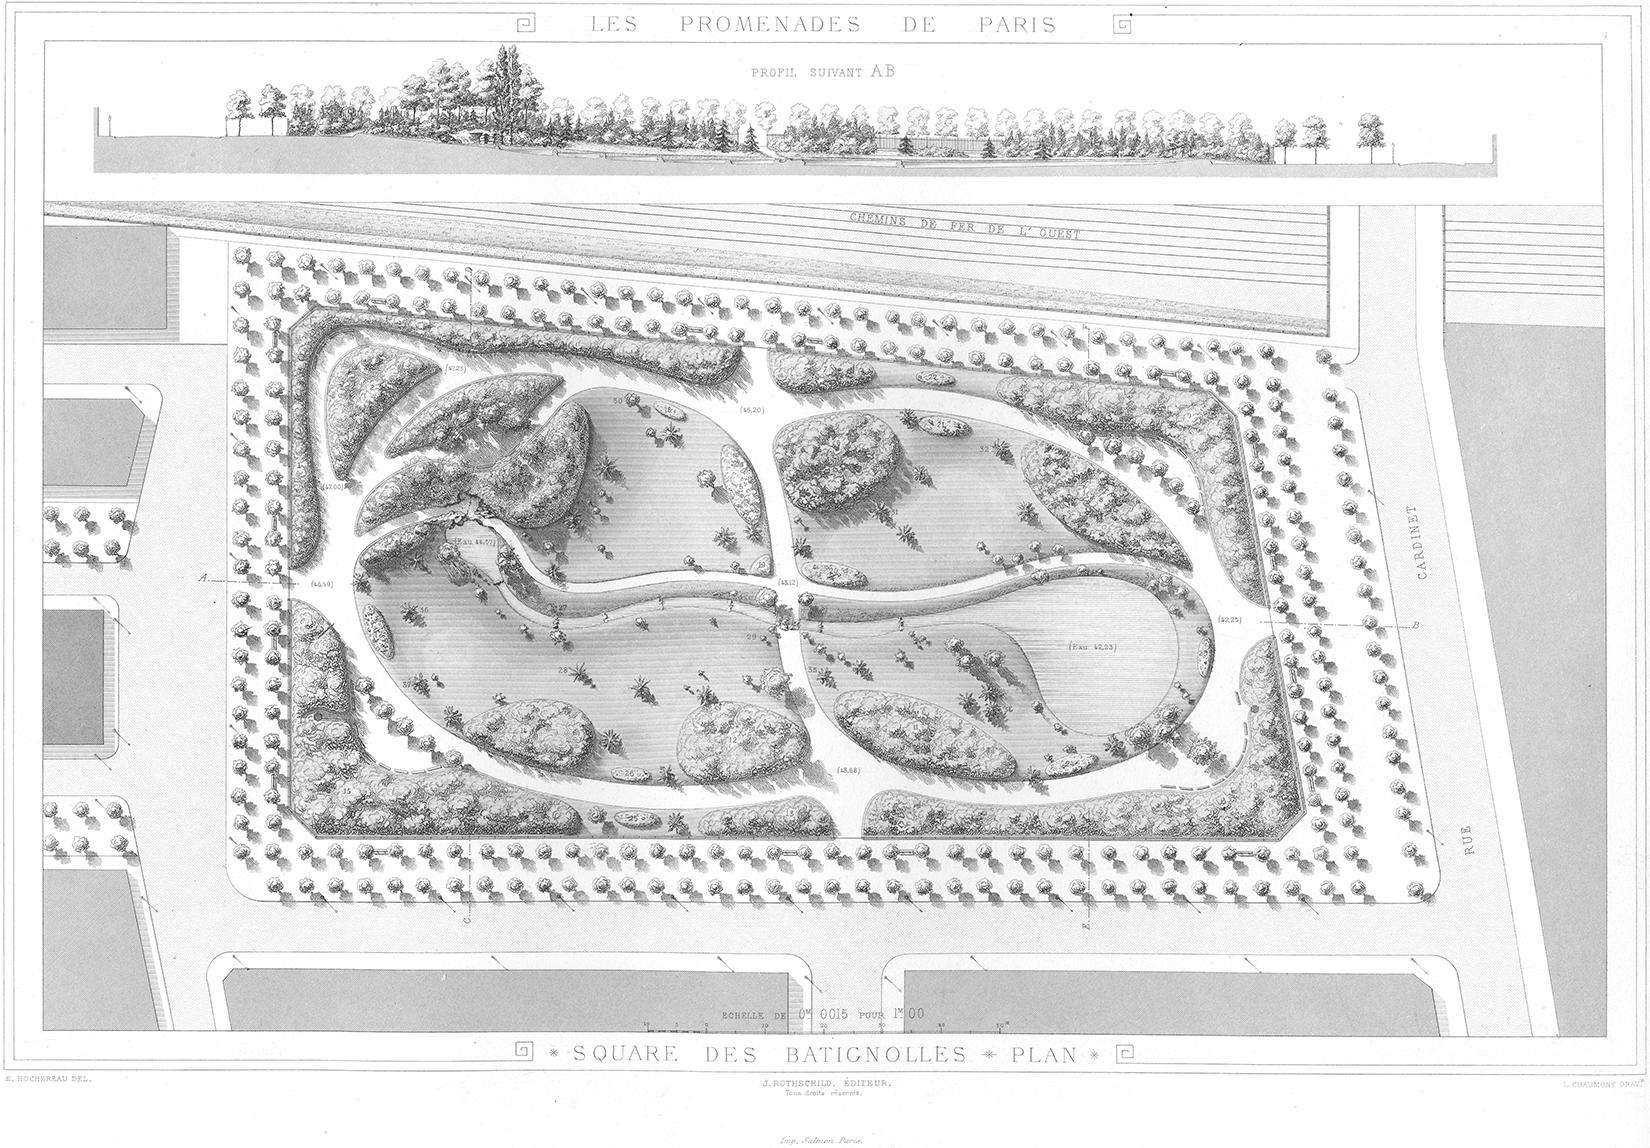 Les Promenades de Paris (Adolphe Alphand)